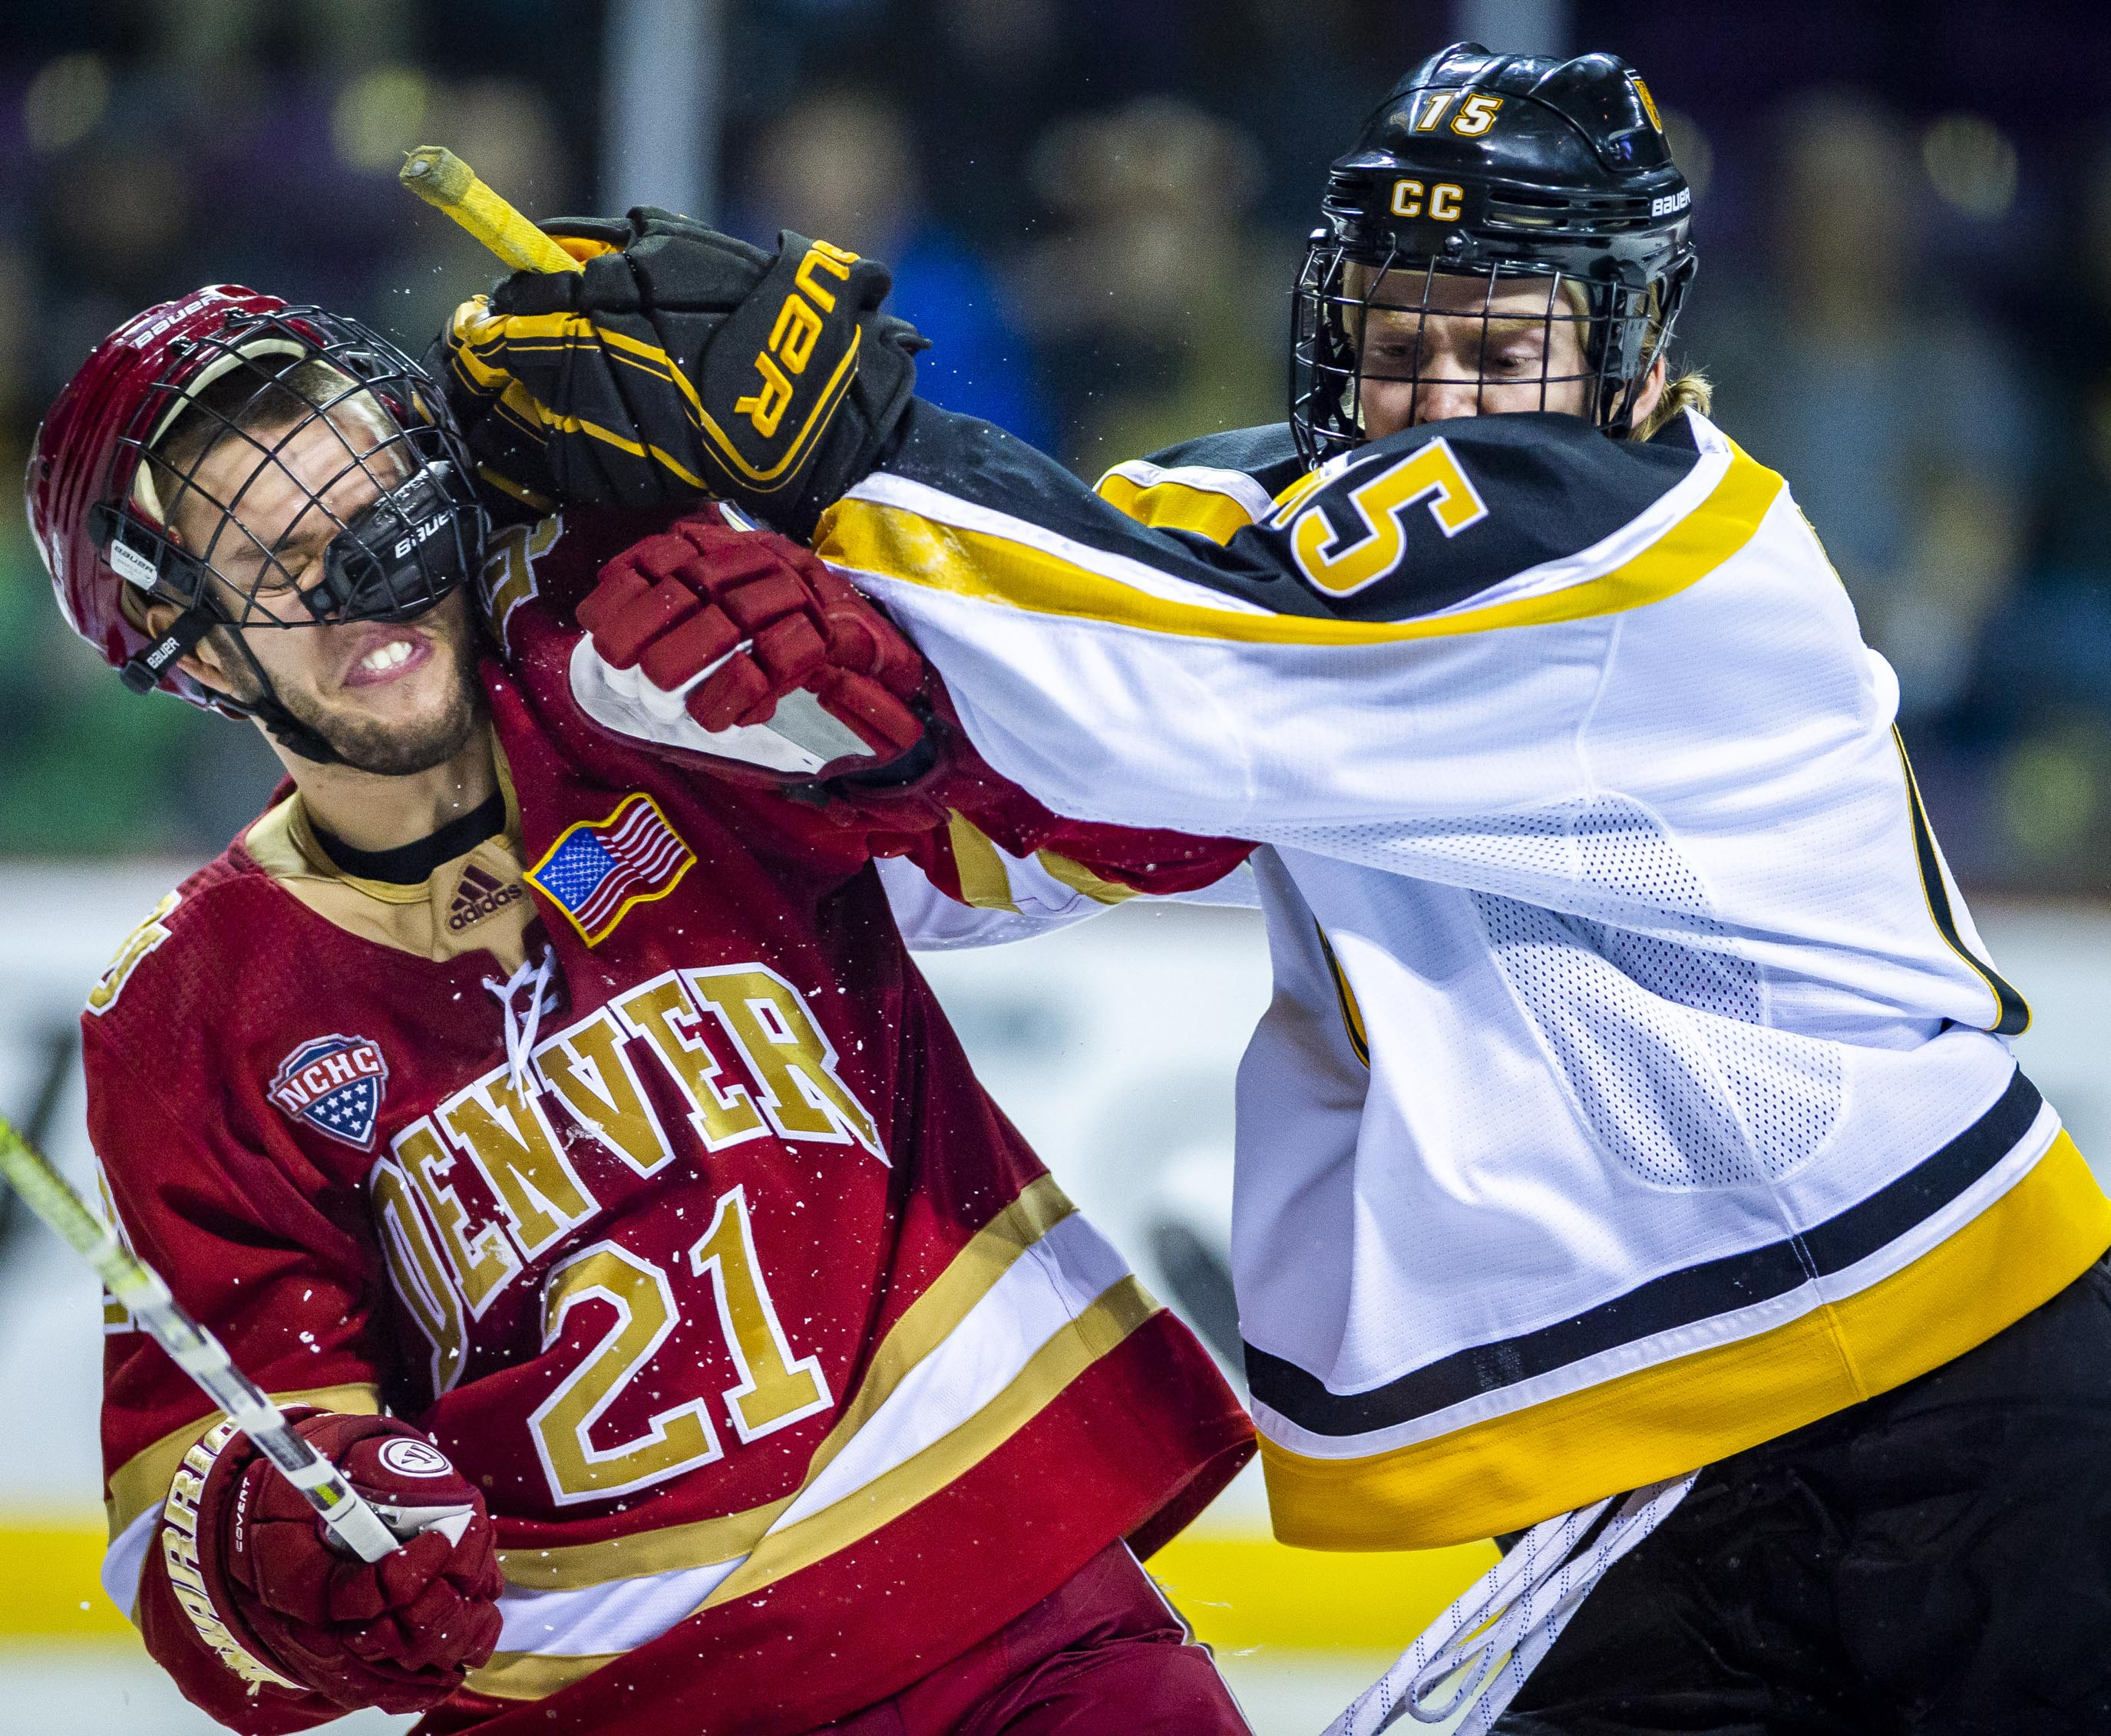 e3b7472f625 University of Denver defenseman Michael Davies gets hit by Colorado College  forward Mason Bergh at the Broadmoor World Arena on Tuesday